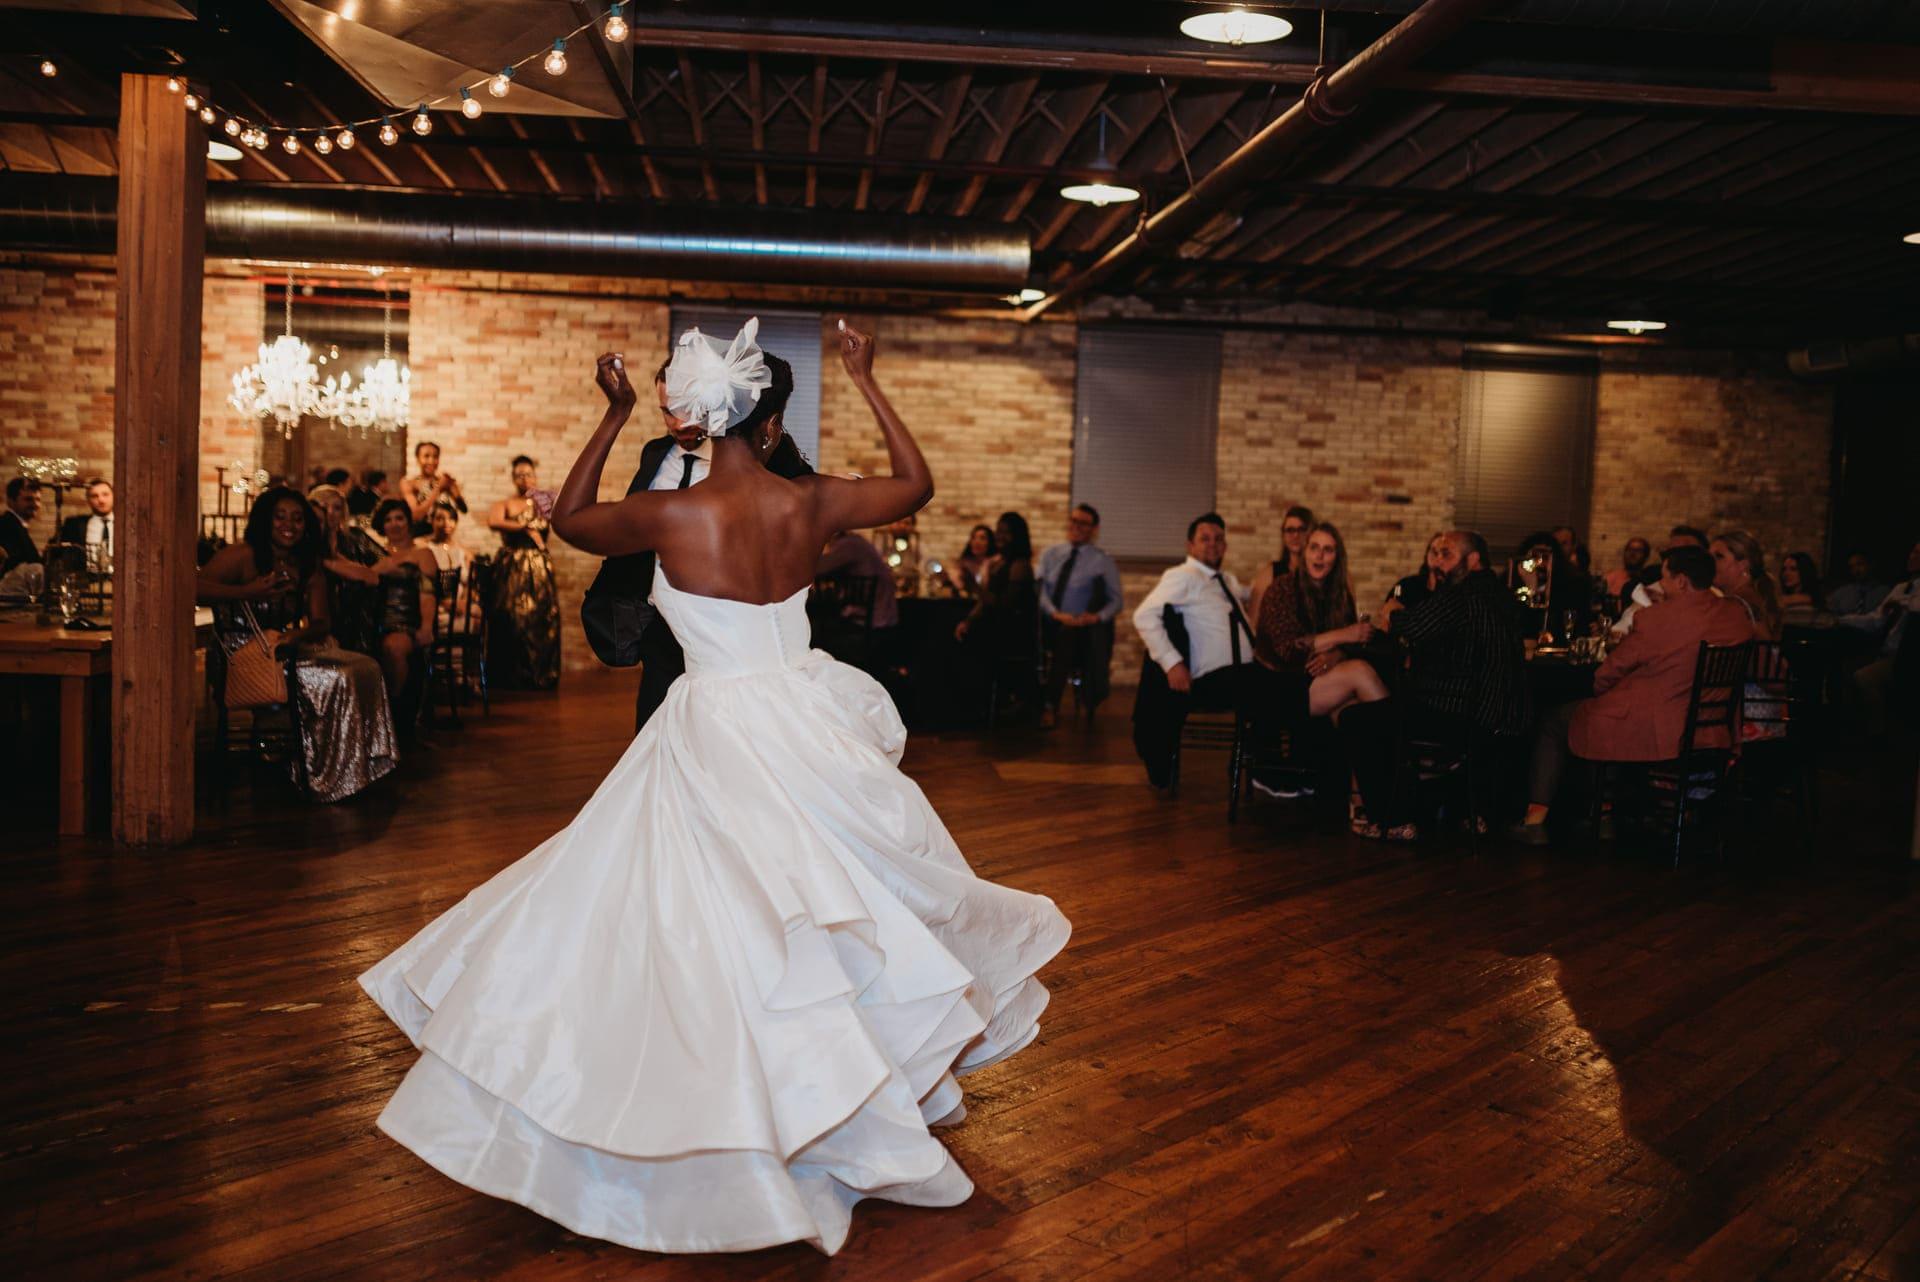 Dancing Bride Richland Michigan Wedding Photography